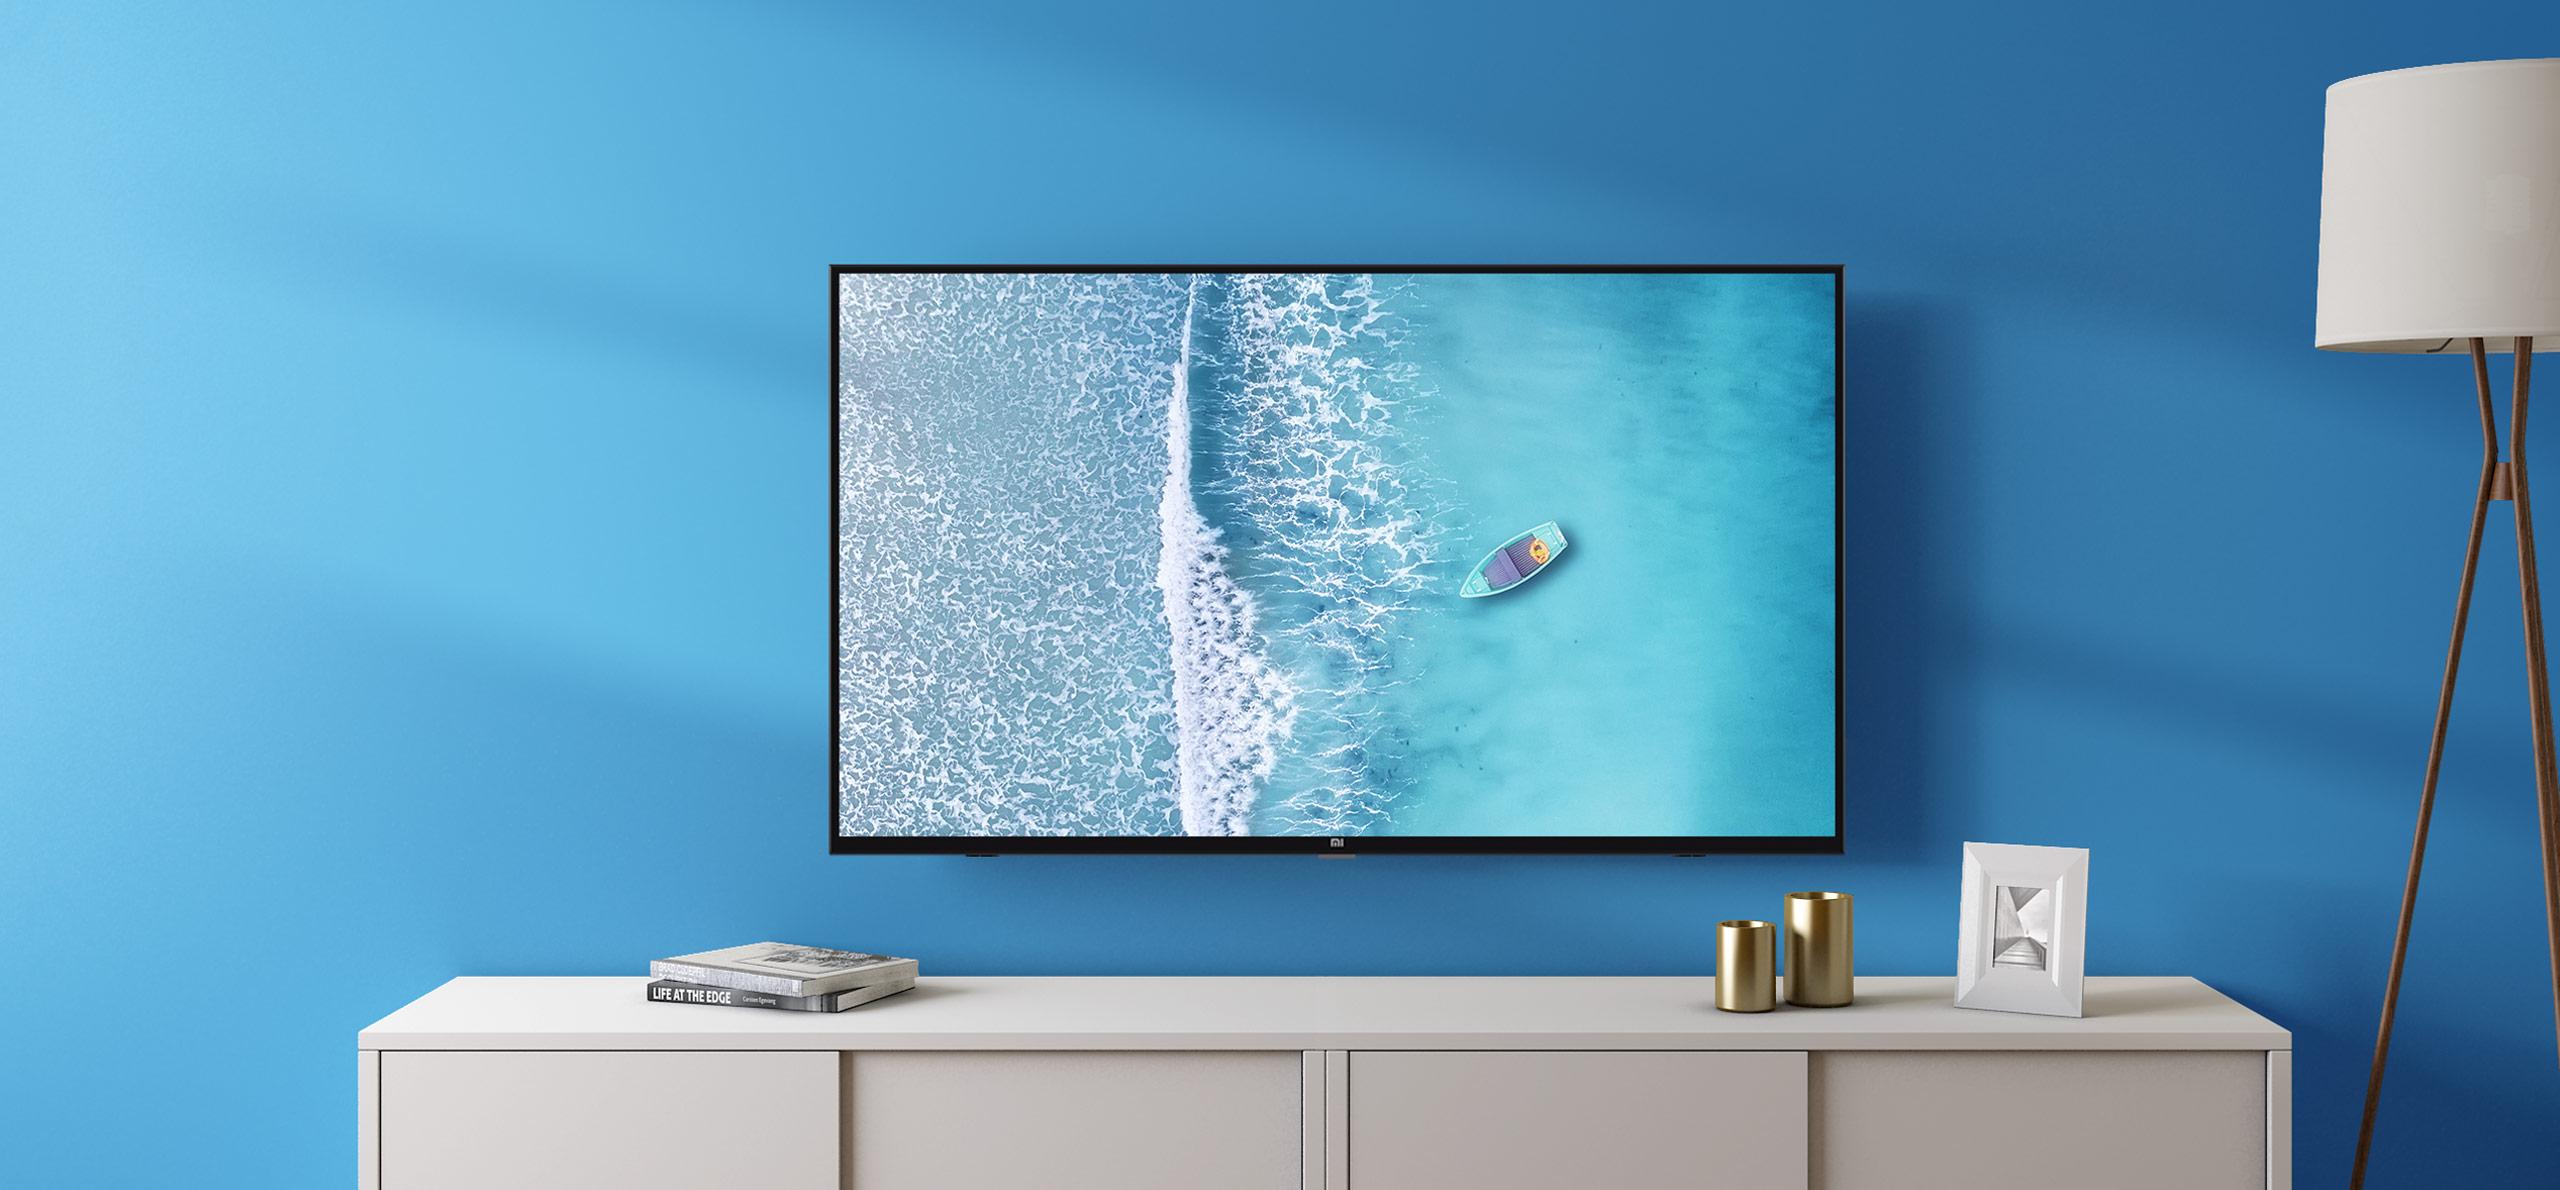 Mi LED TV 4A PRO 43